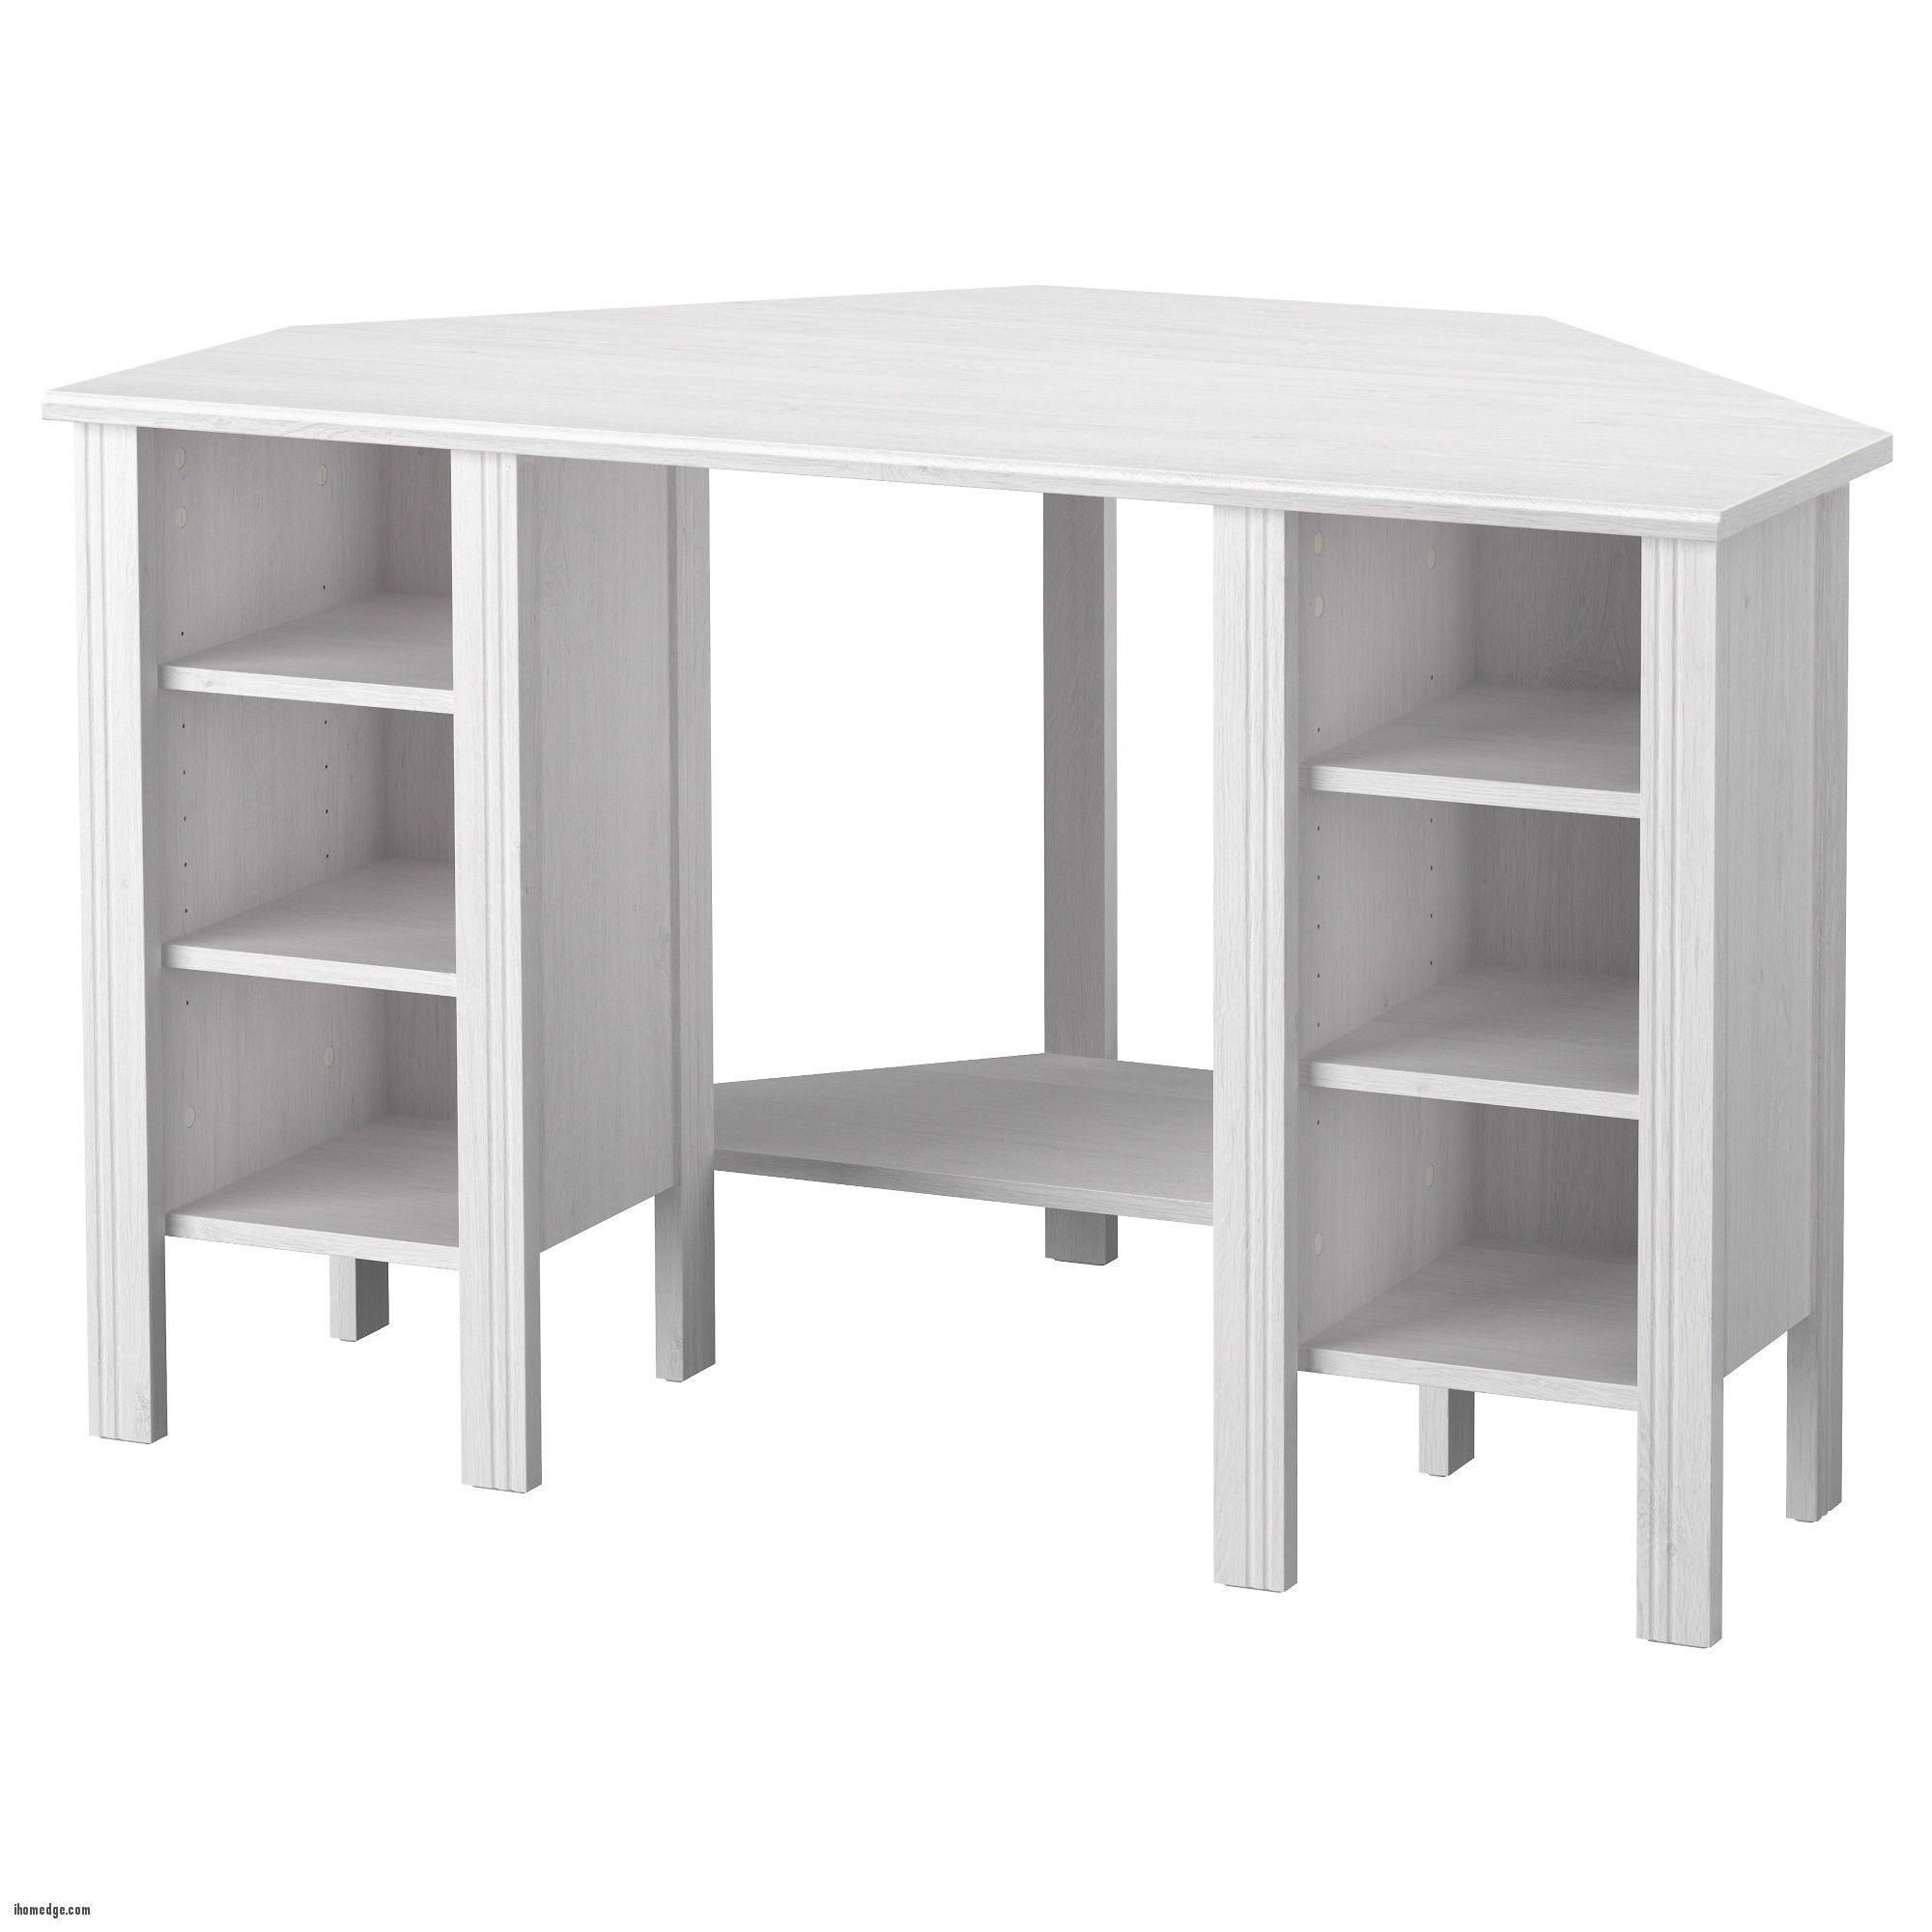 Black And White Pillows White Corner Desk Small Corner Desk Ikea Corner Desk